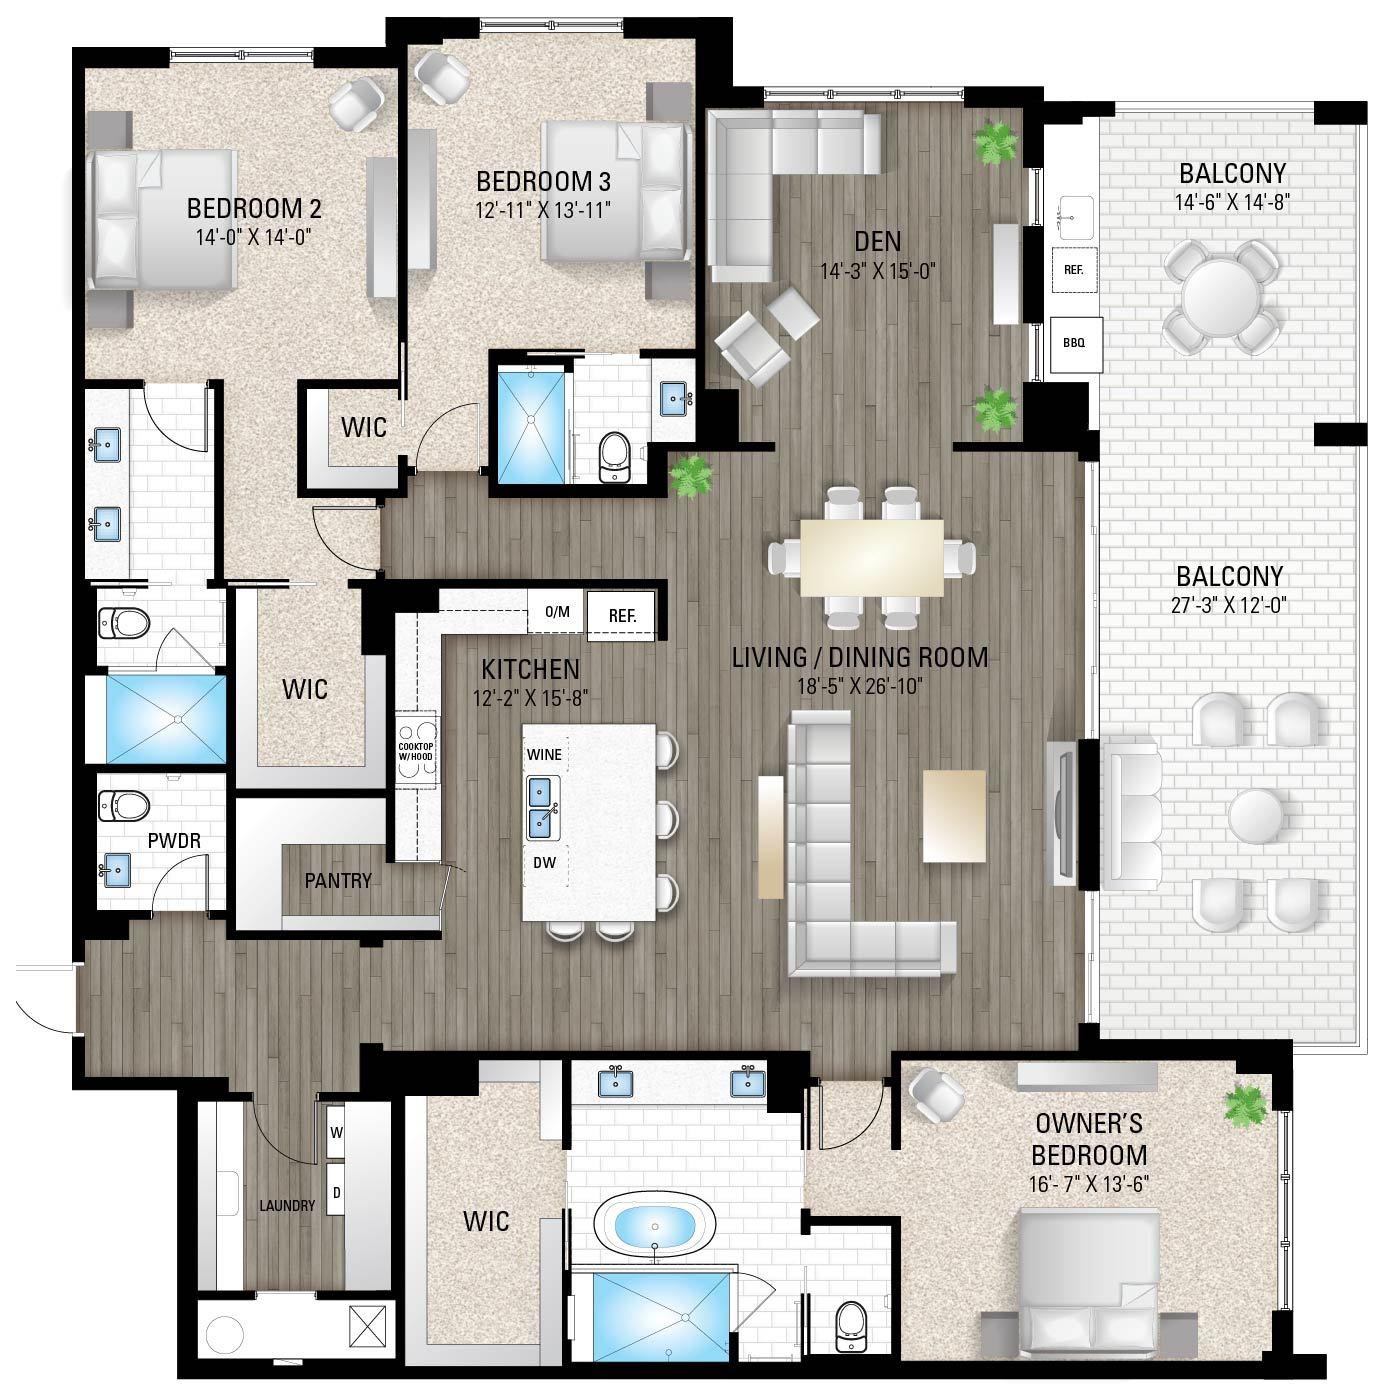 The Delray 2:3 Bedrooms / 3.5 Baths / Den